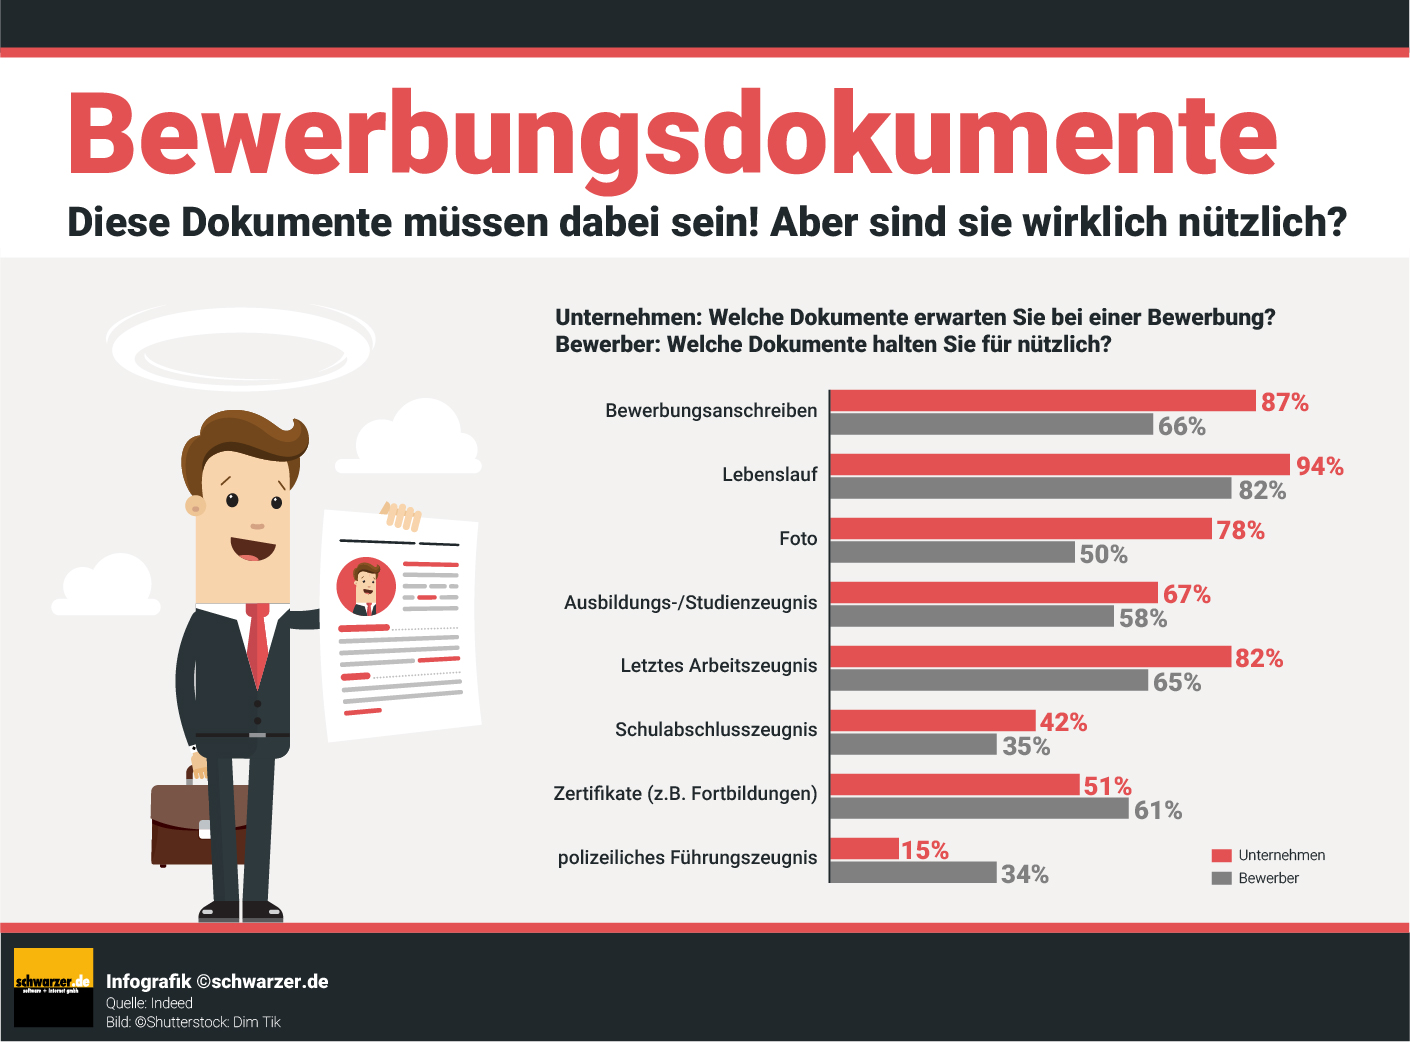 Infografik: Bewerbungsdokumente